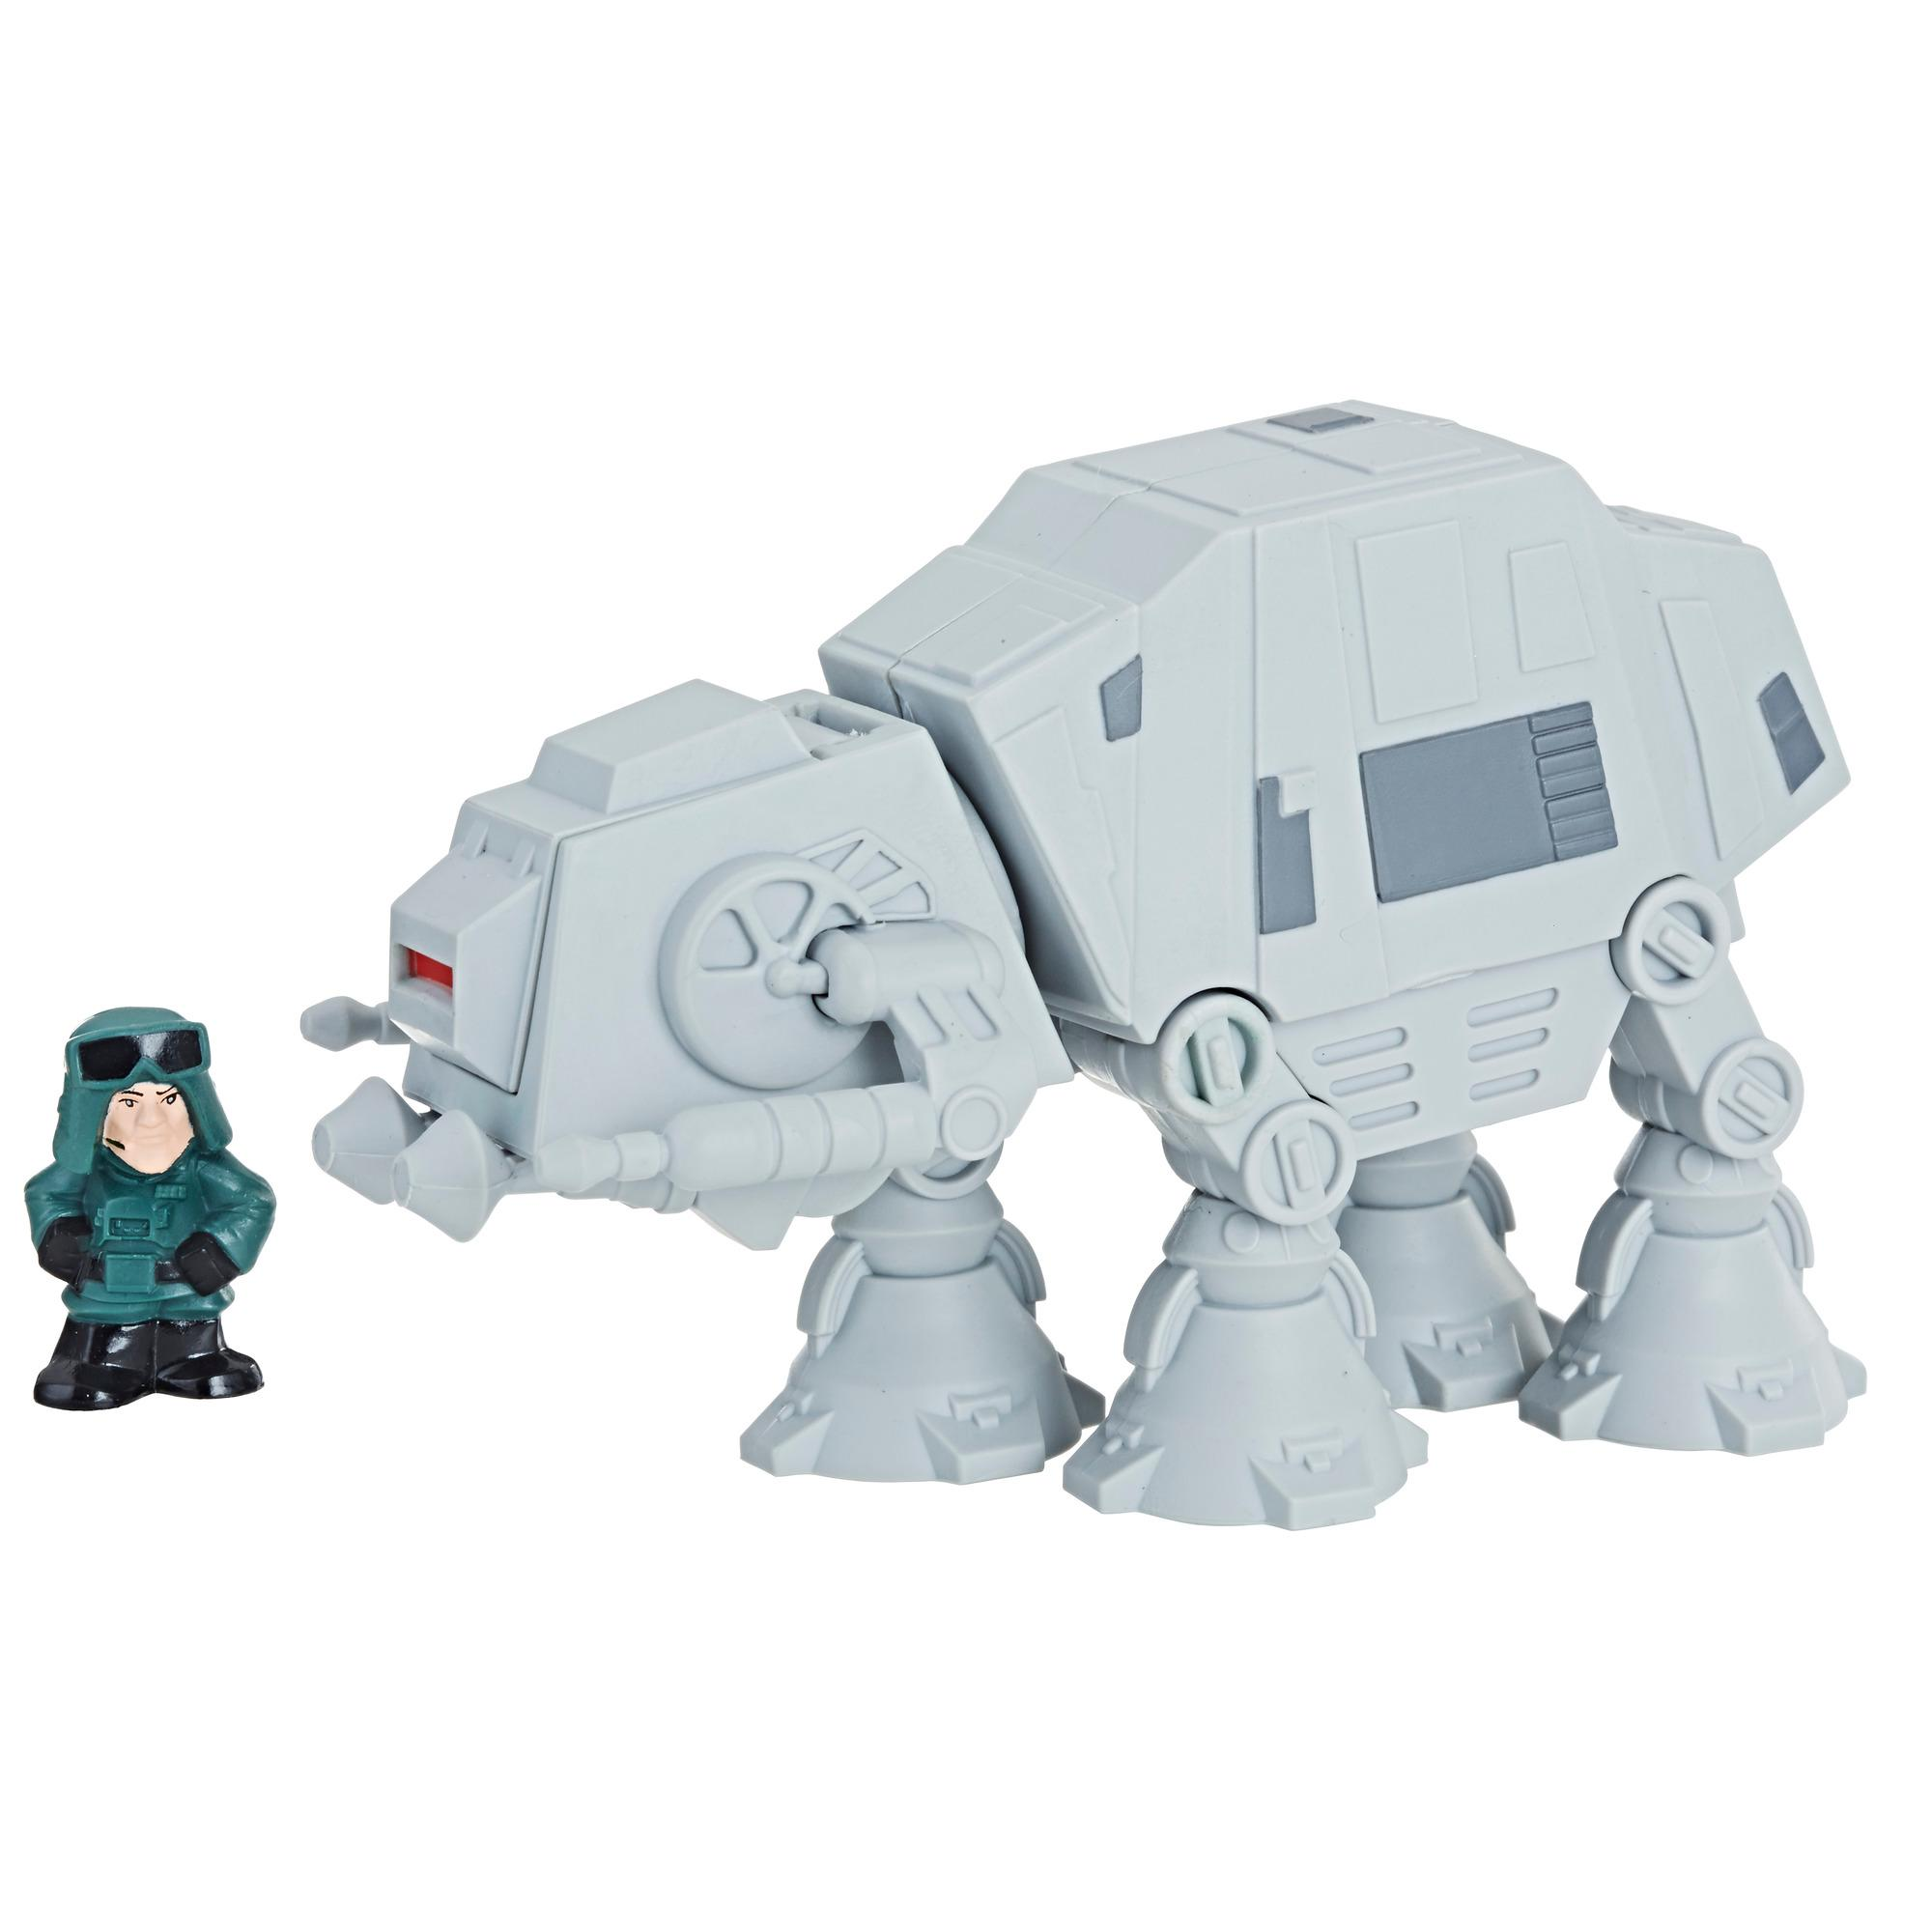 Star Wars Micro Force - Ensemble marcheur AT-AT et commandant d'AT-AT